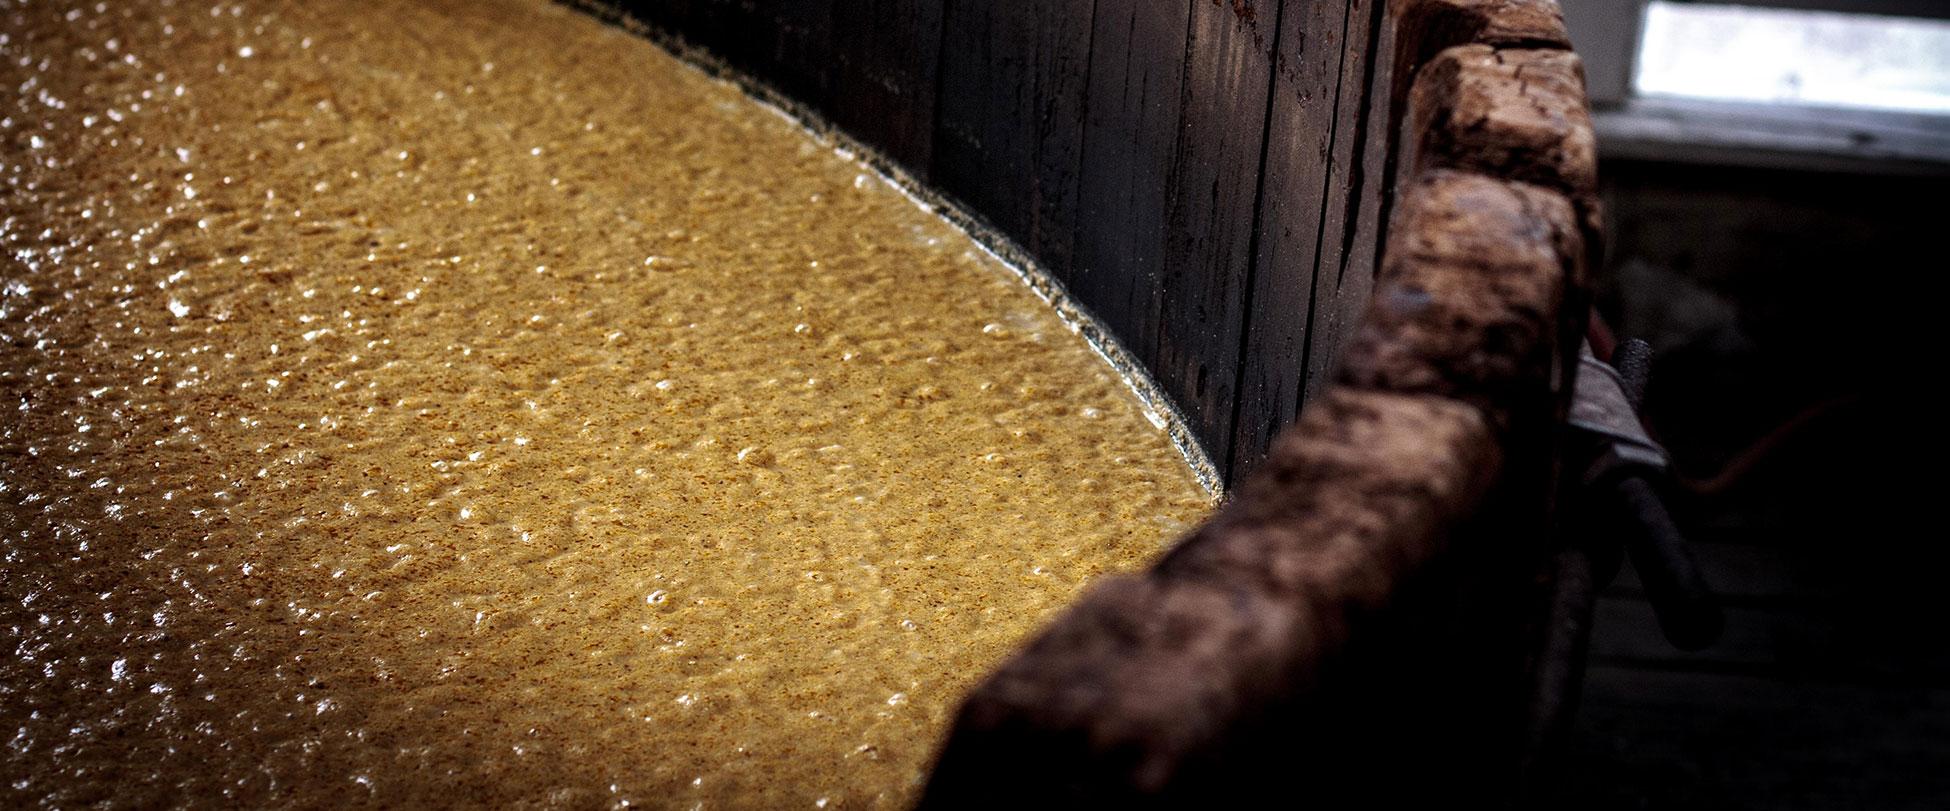 How to make corn moonshine mash